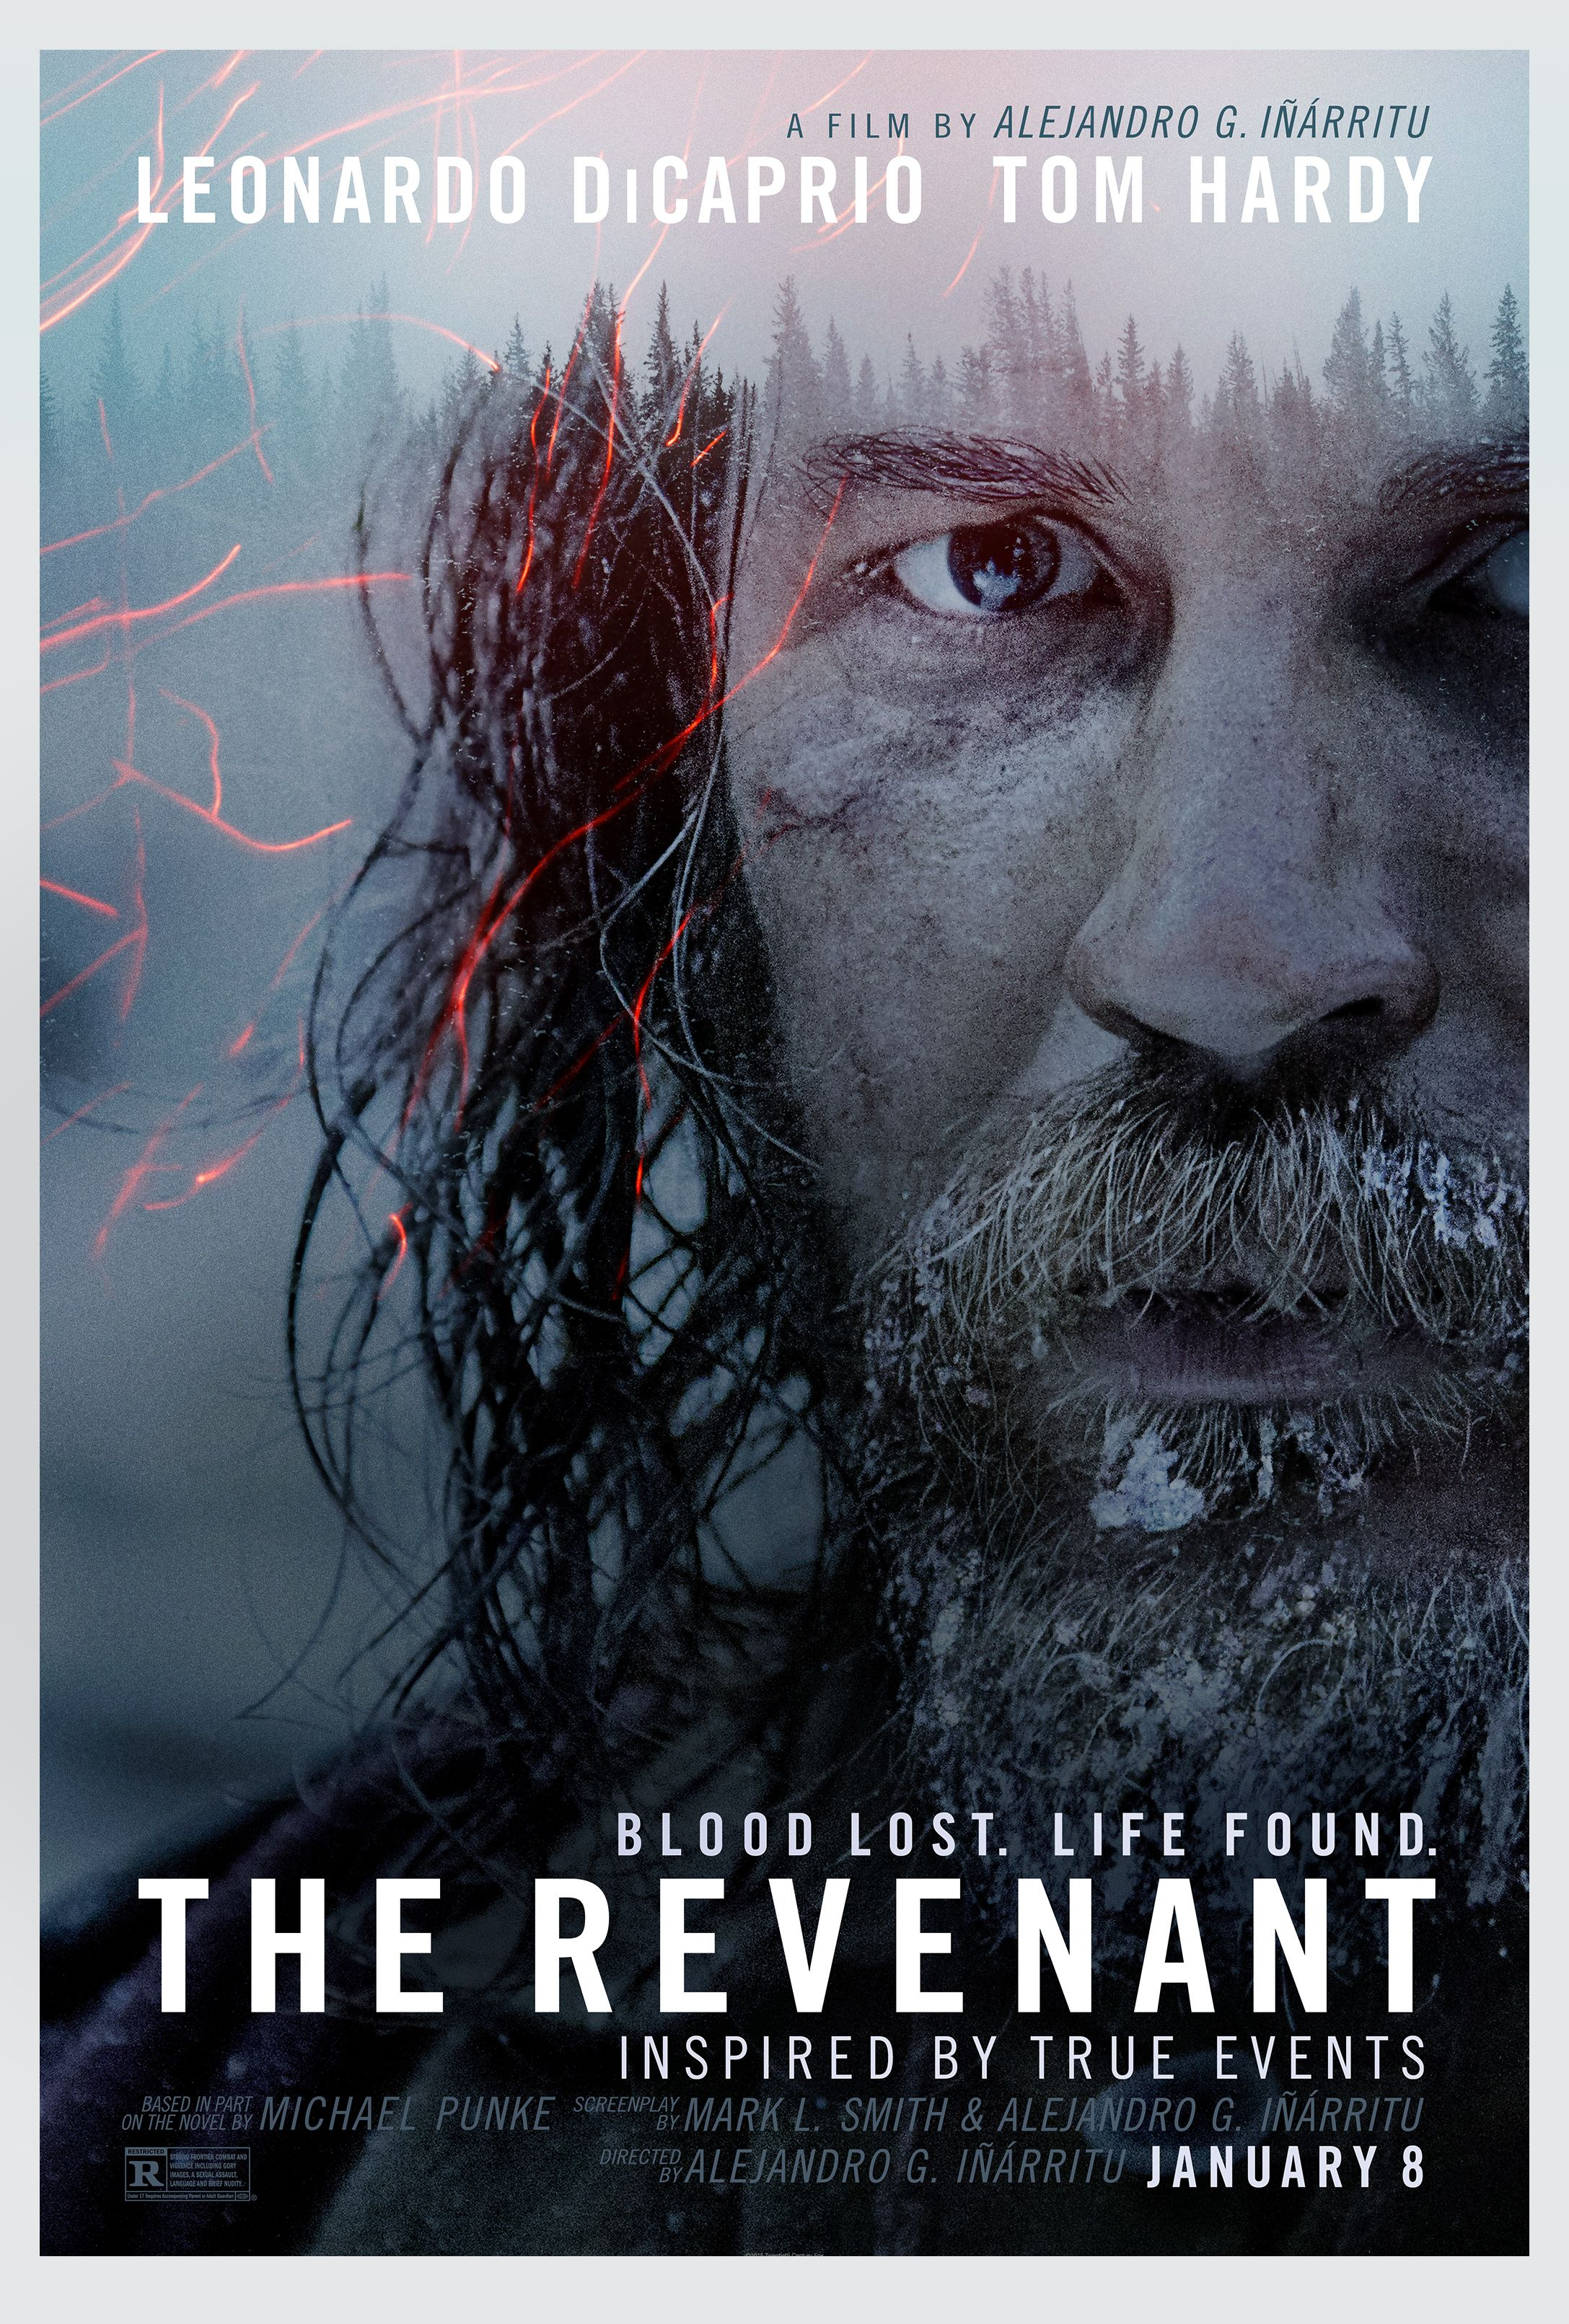 the revenant review i241225rritu�s most effective film yet